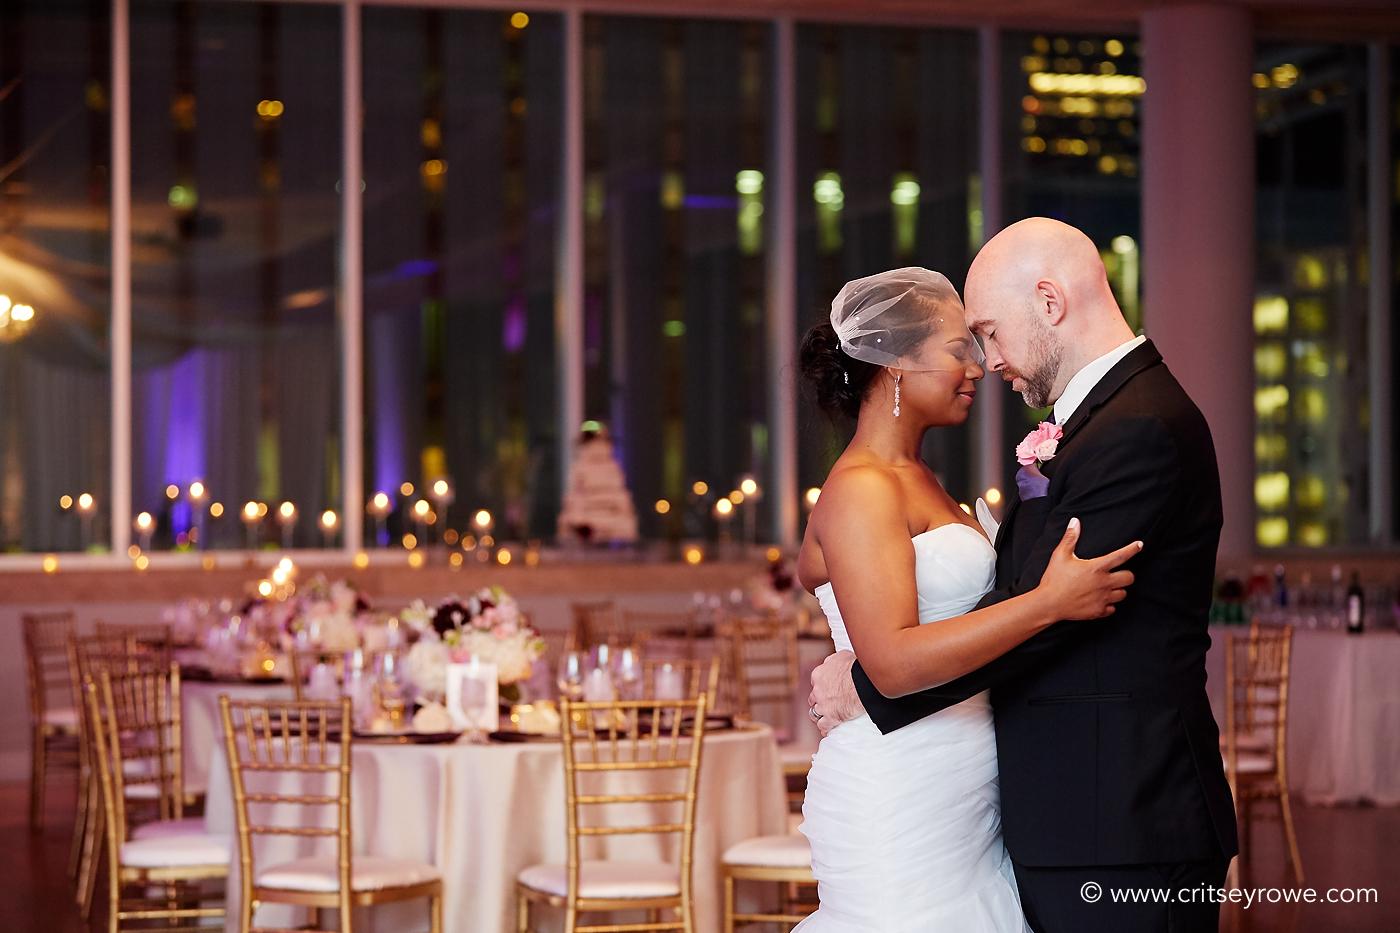 NY | Charlotte Photographers Critsey Rowe